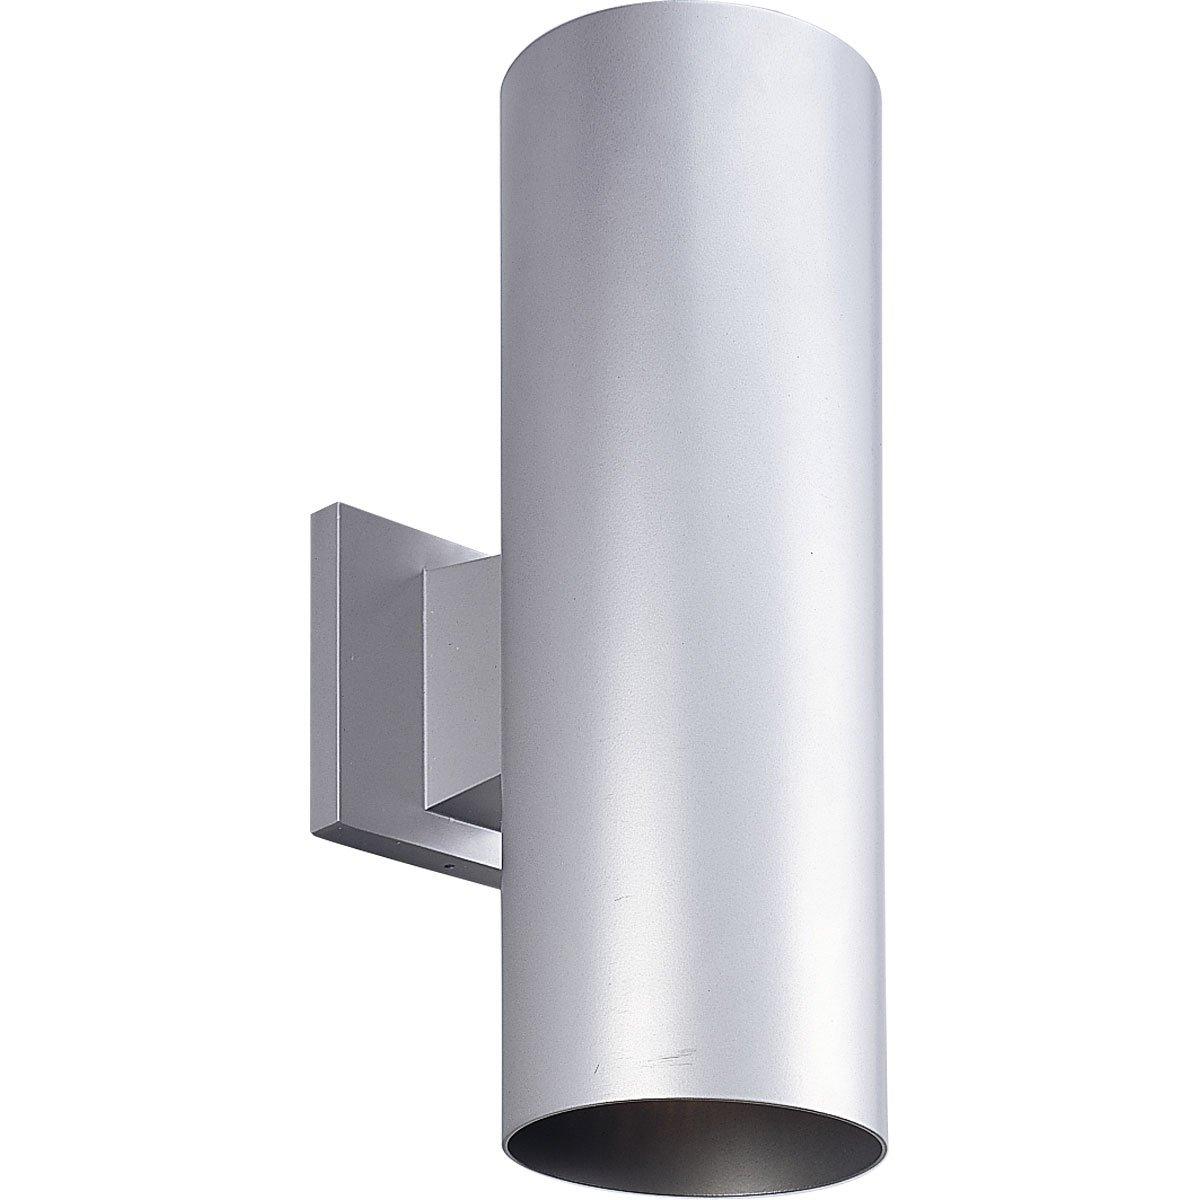 Progress Lighting P5675-82 Wall Cylinder Outdoor Light PAR 30 5  x 14  (Metallic Gray) - Wall Porch Lights - Amazon.com  sc 1 st  Amazon.com & Progress Lighting P5675-82 Wall Cylinder Outdoor Light PAR 30 5 ... azcodes.com